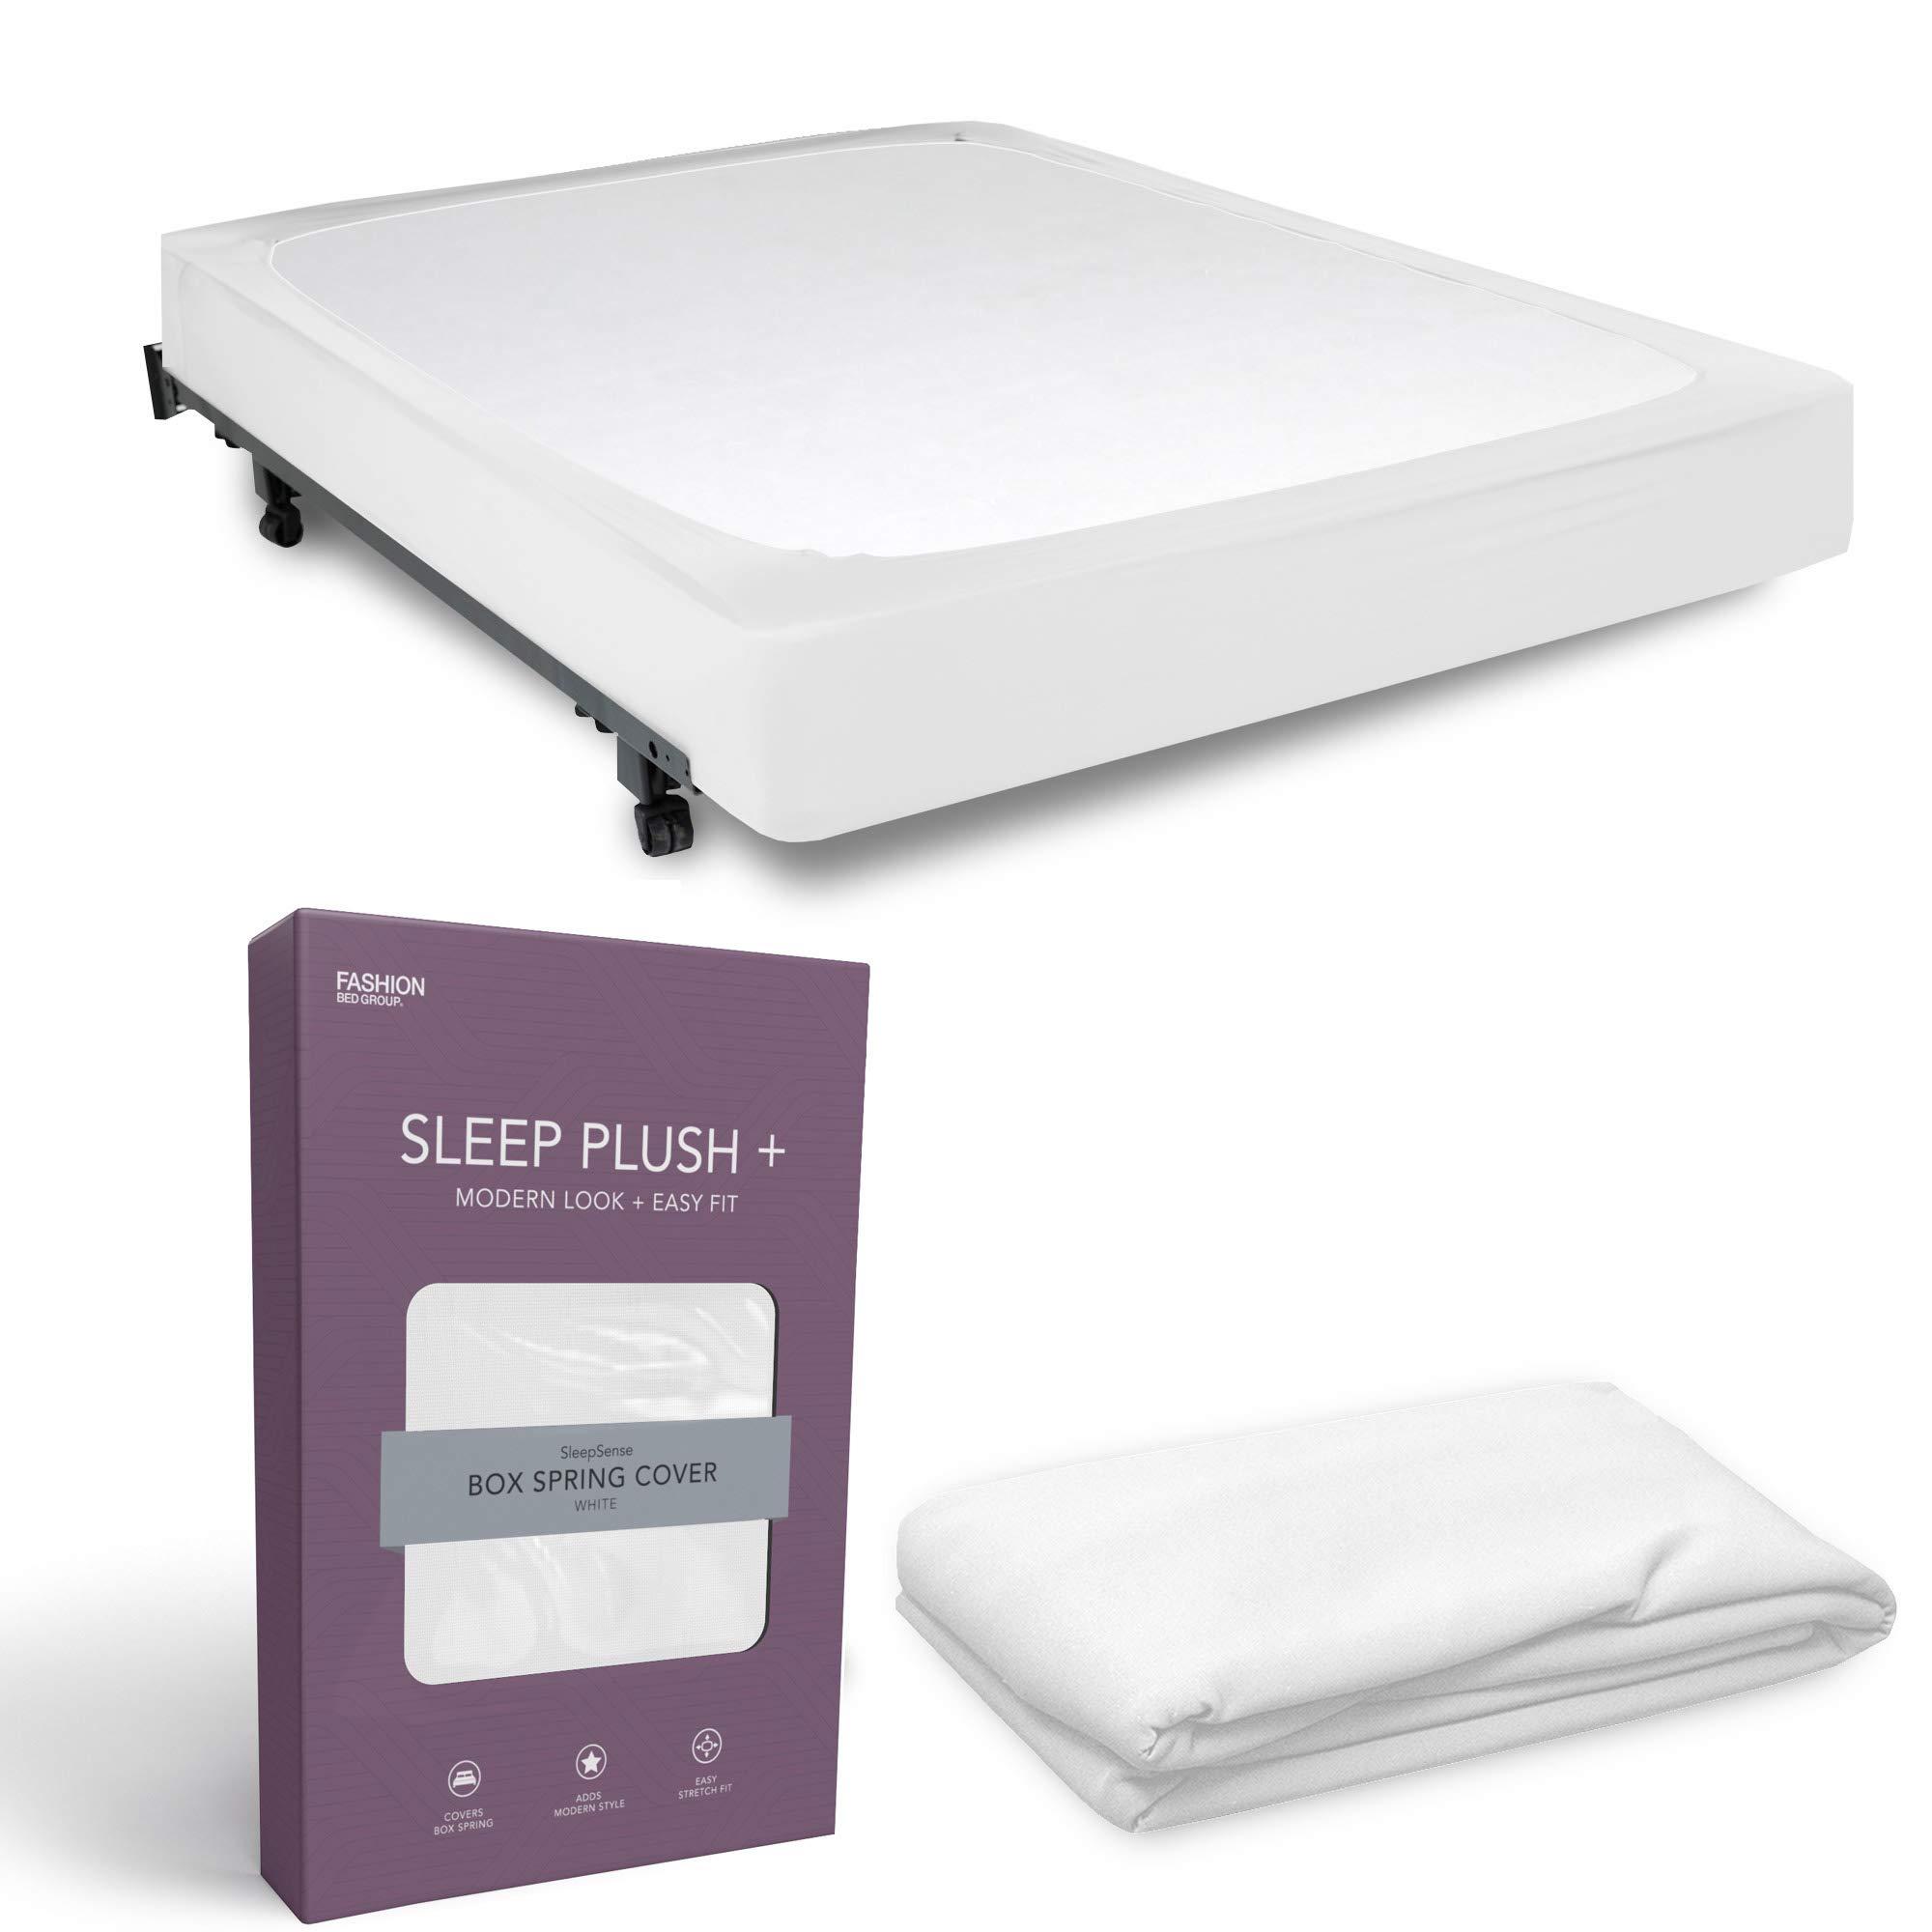 Queen FREE2DAYSHIP TAXFREE Sleep Plush StyleWrap White Fabric Box Spring Cover